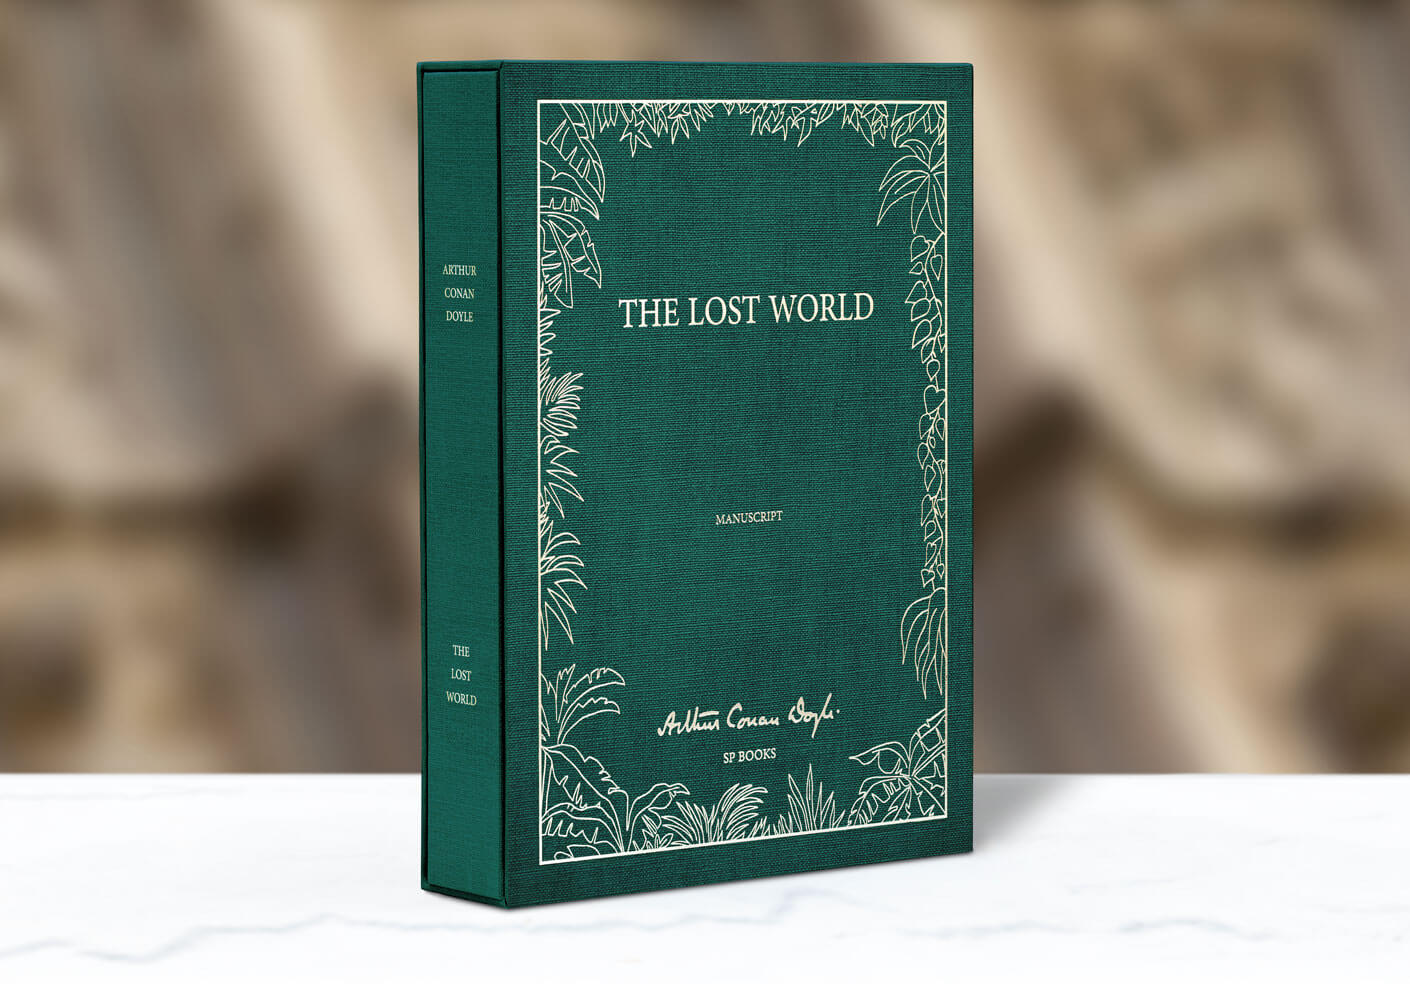 Conan Doyle - manuscript and slipcase